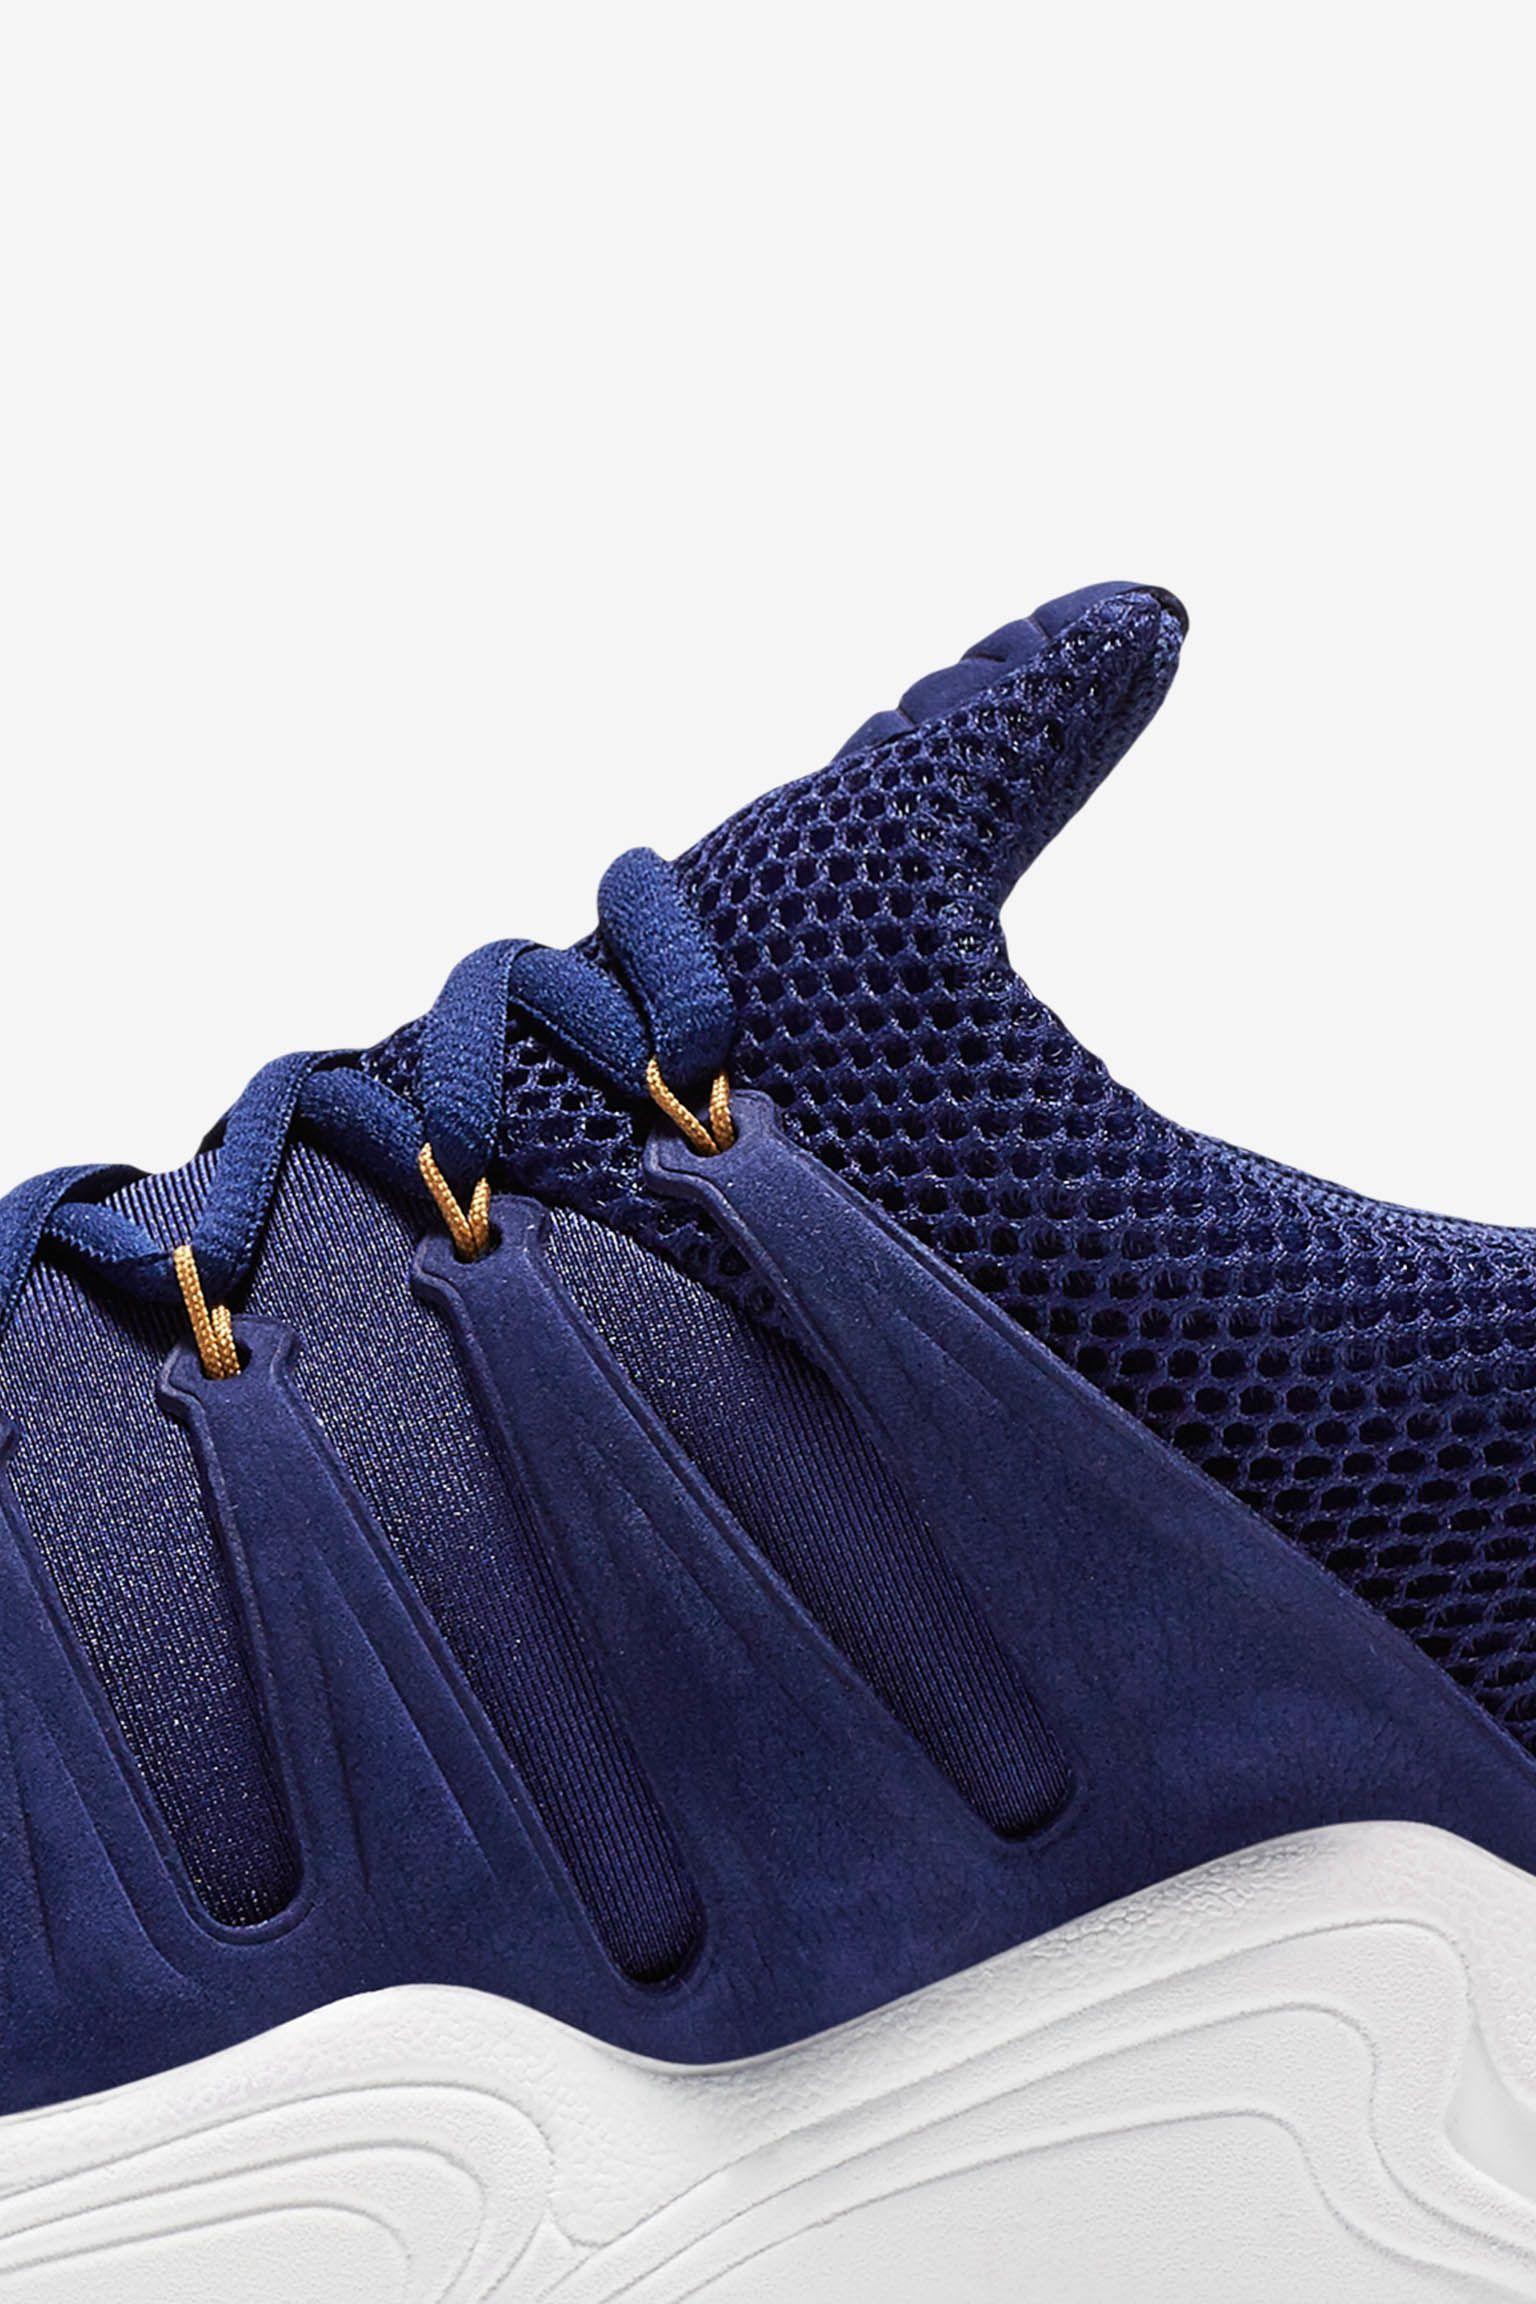 NikeLab Air Zoom Spirimic 'Loyal Blue'